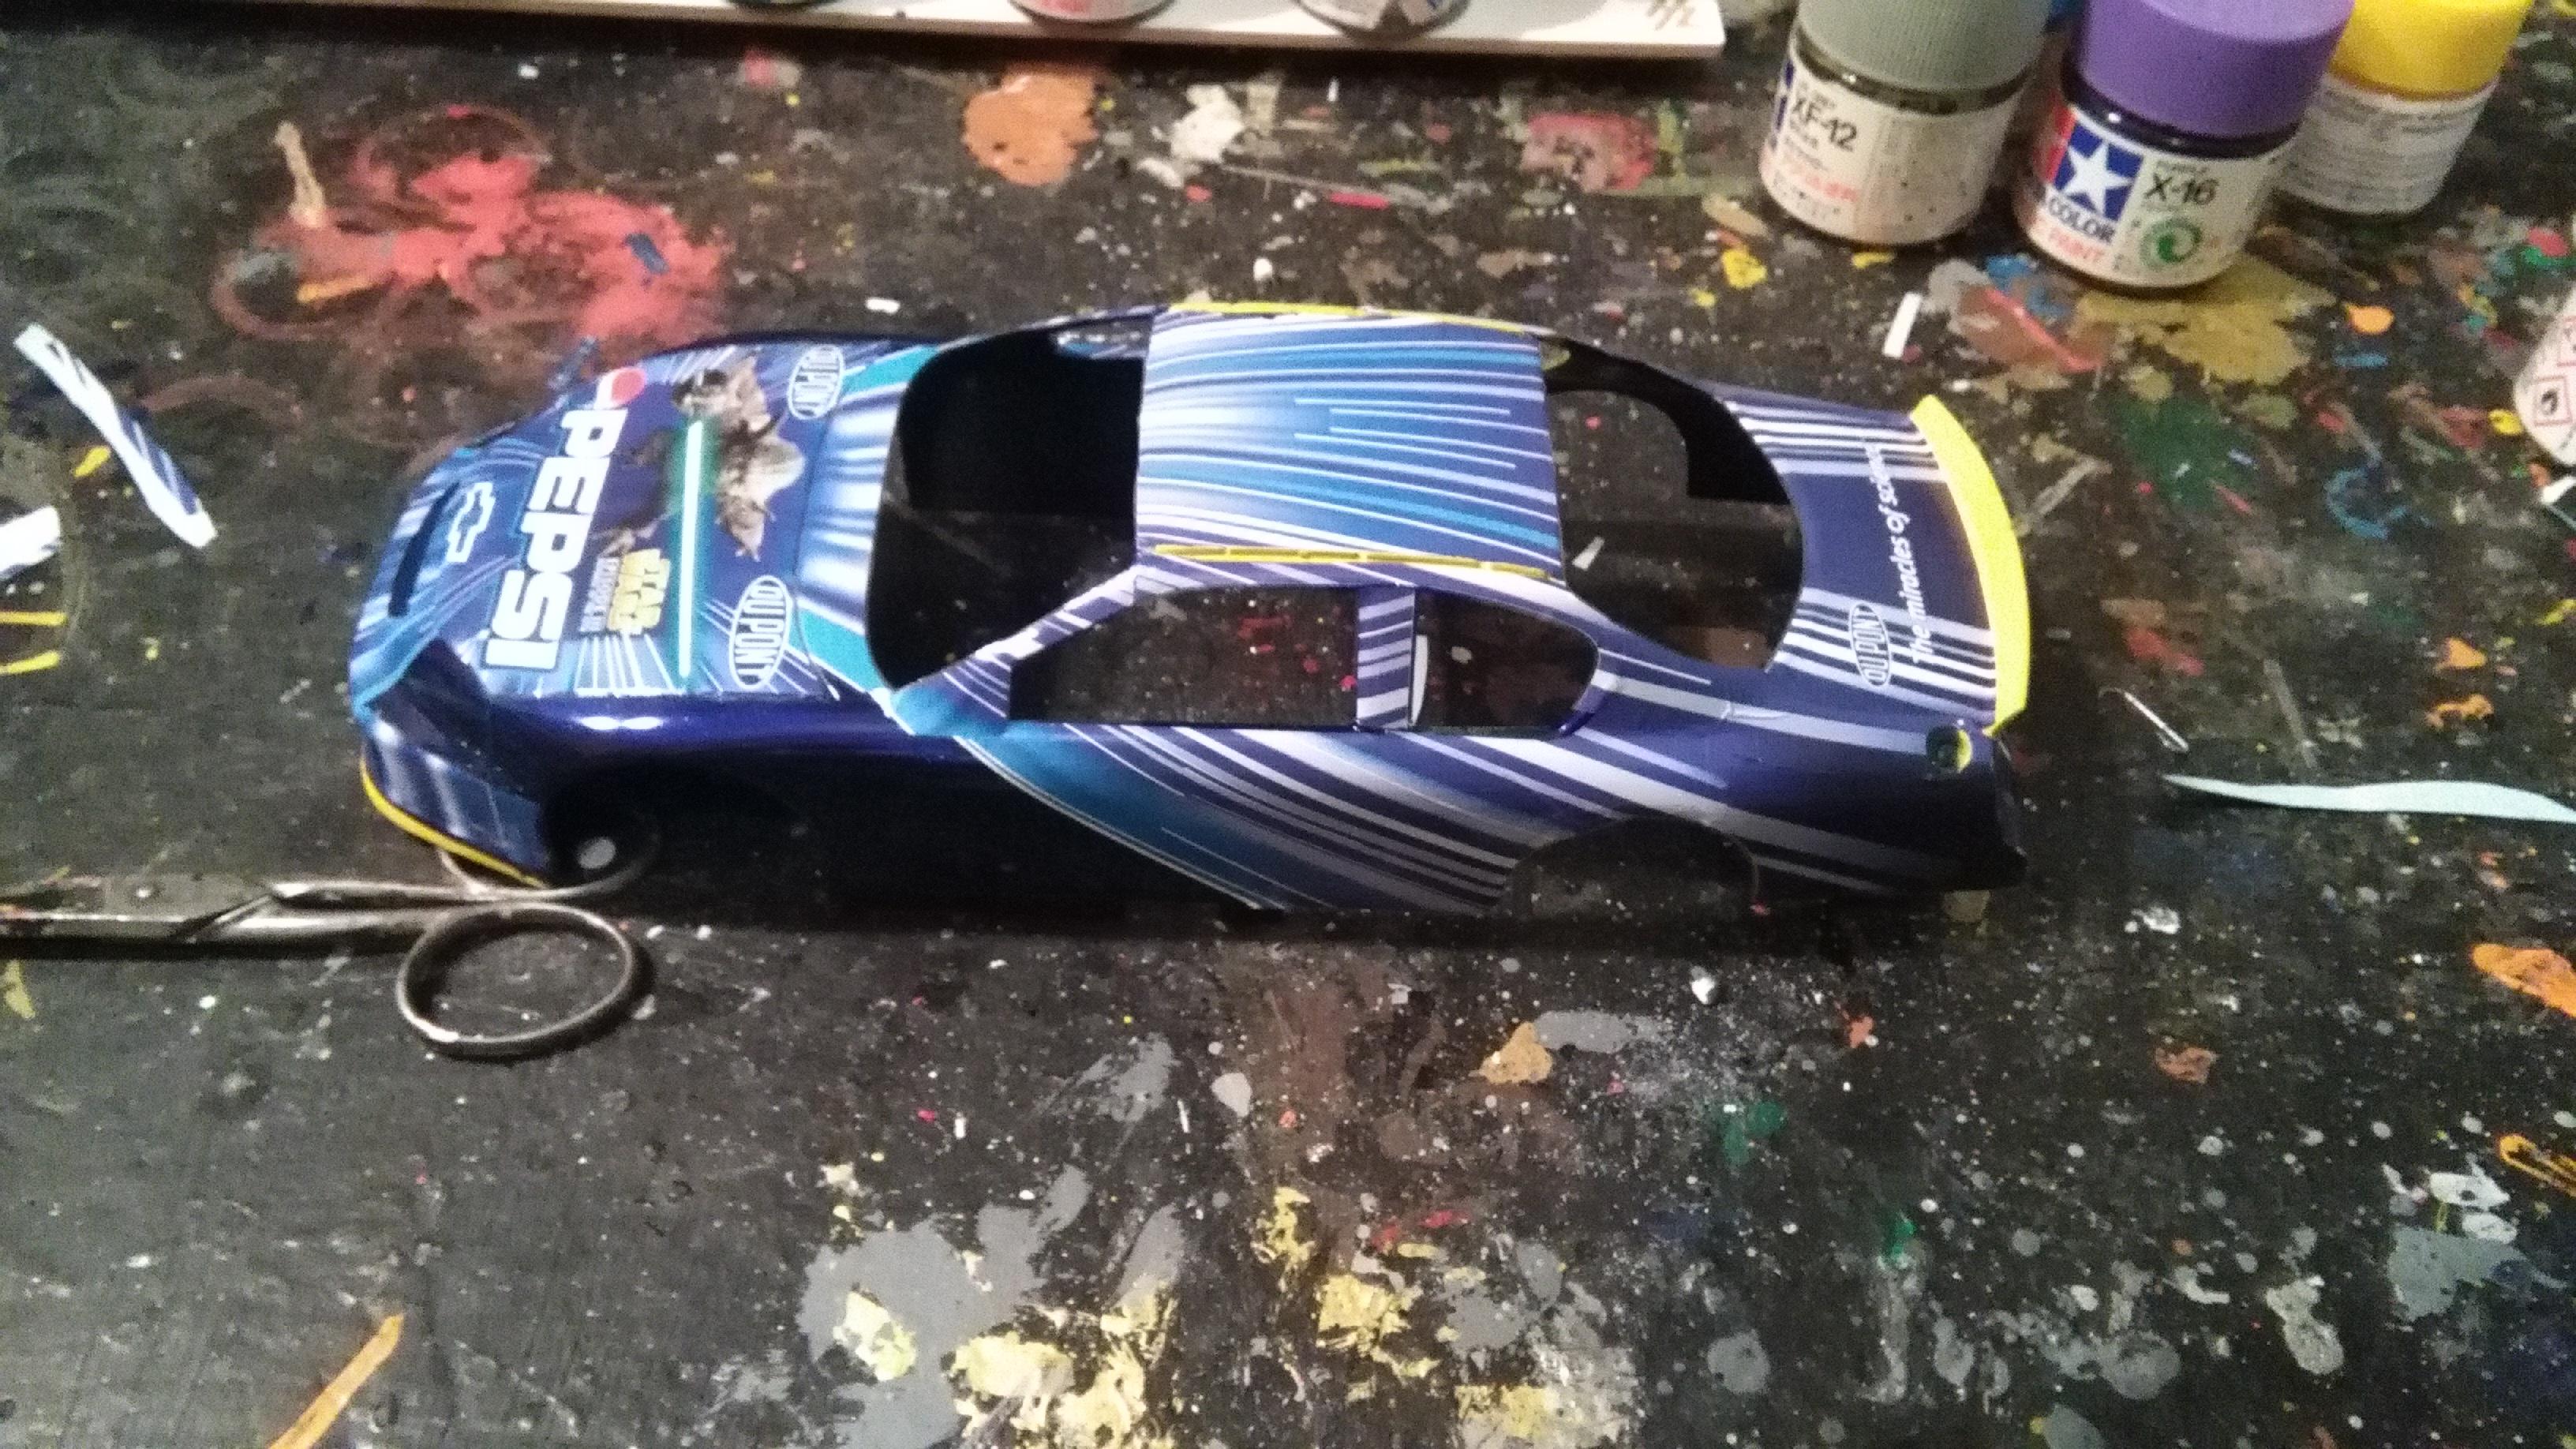 Chevy Monte-Carlo 2005 #24 Jeff Gordon Pepsi/Star Wars  523561IMG20170428213042